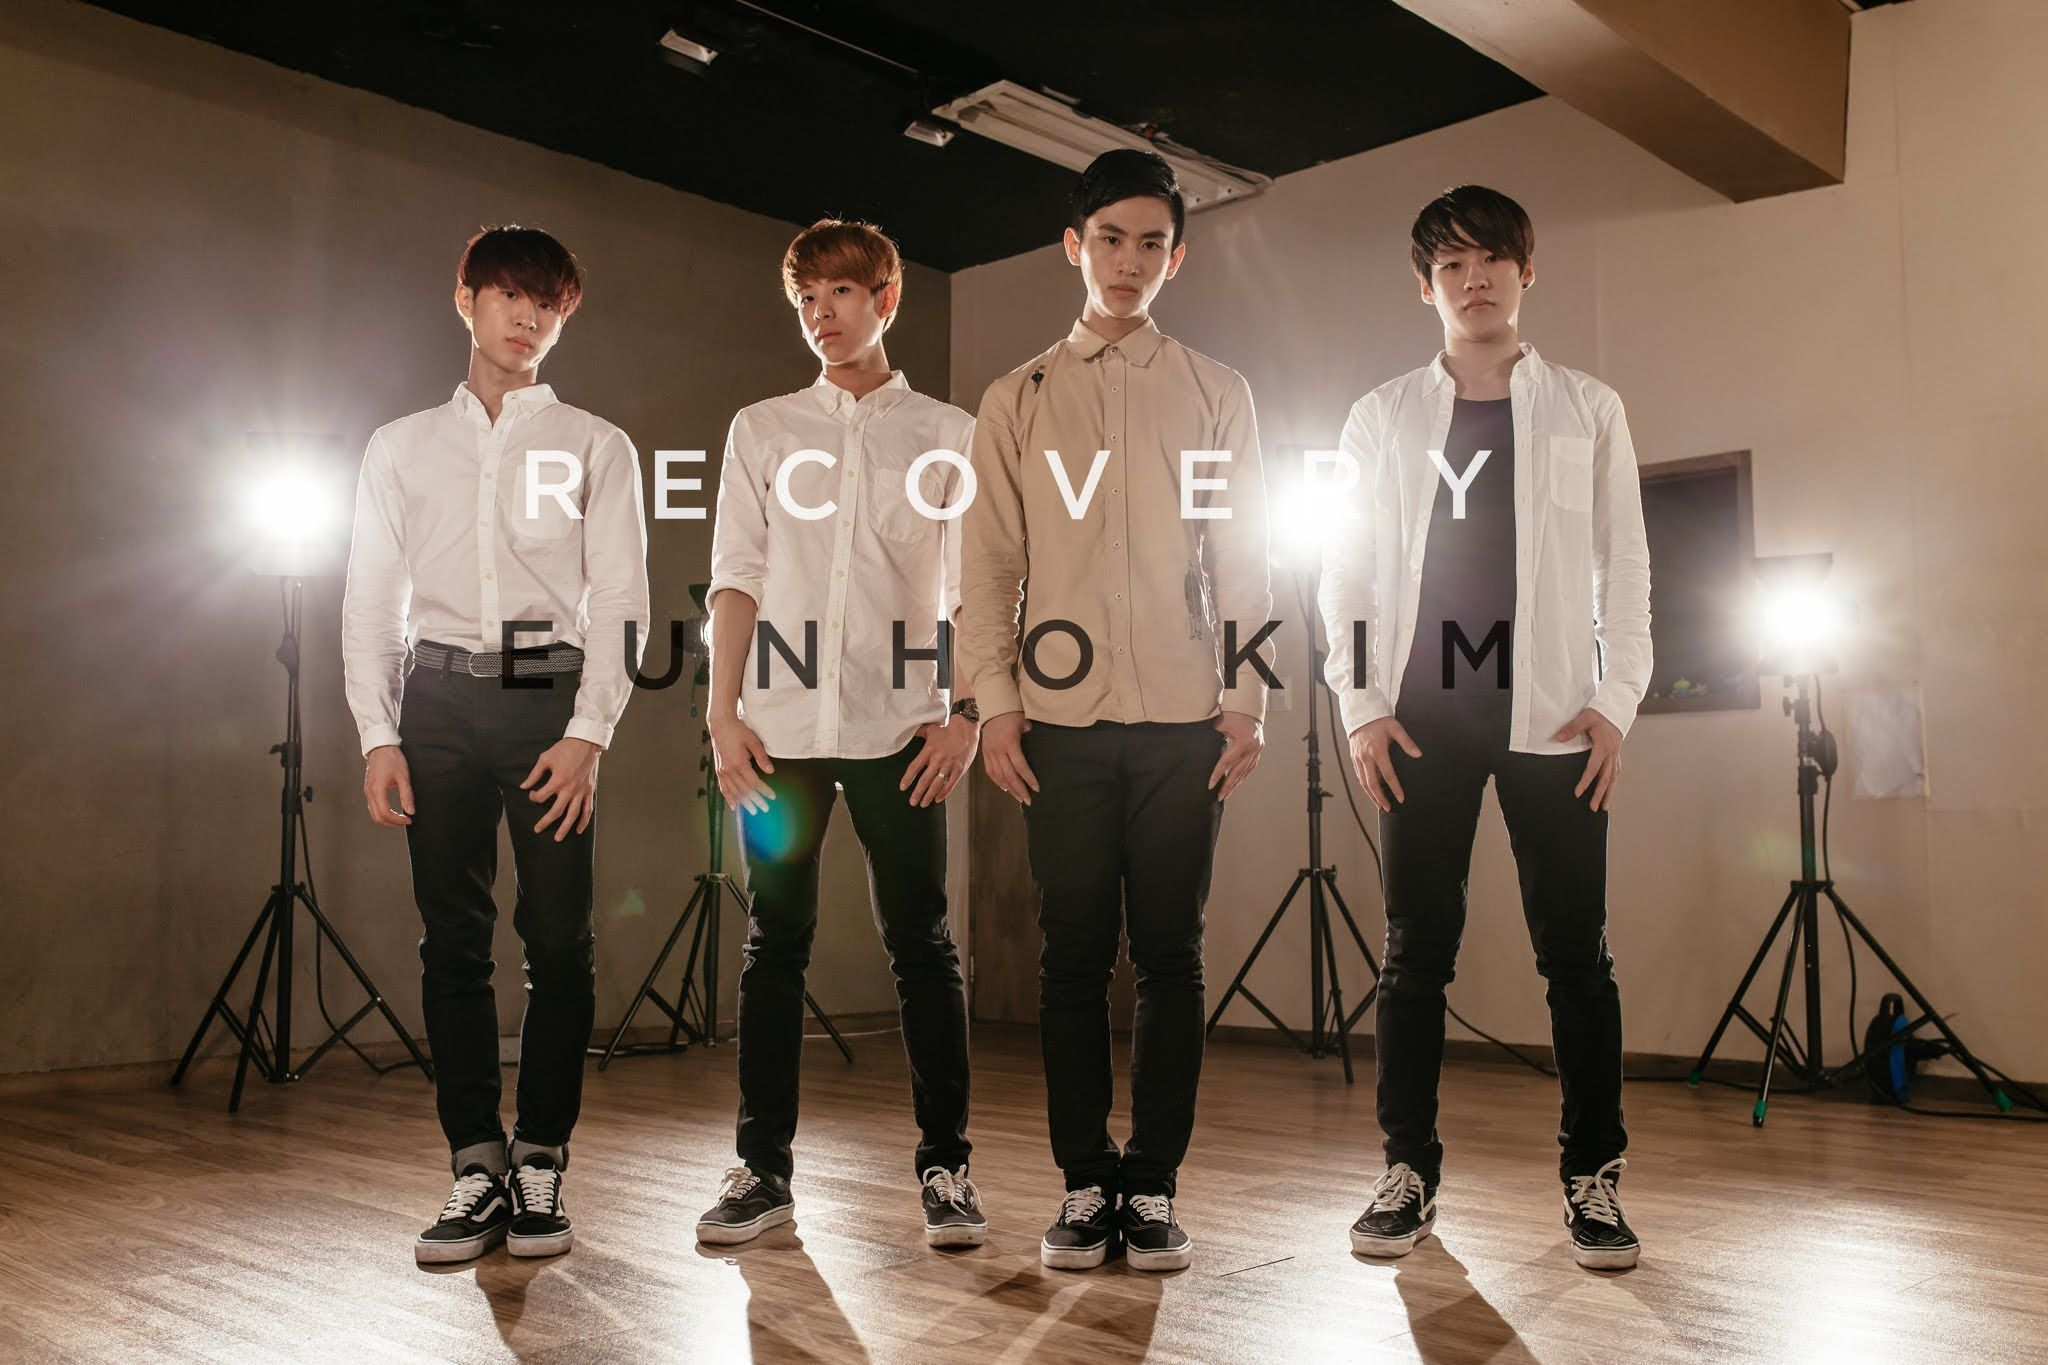 Eunho Kim Choreography Recovery Choreography Kim Dance Studio